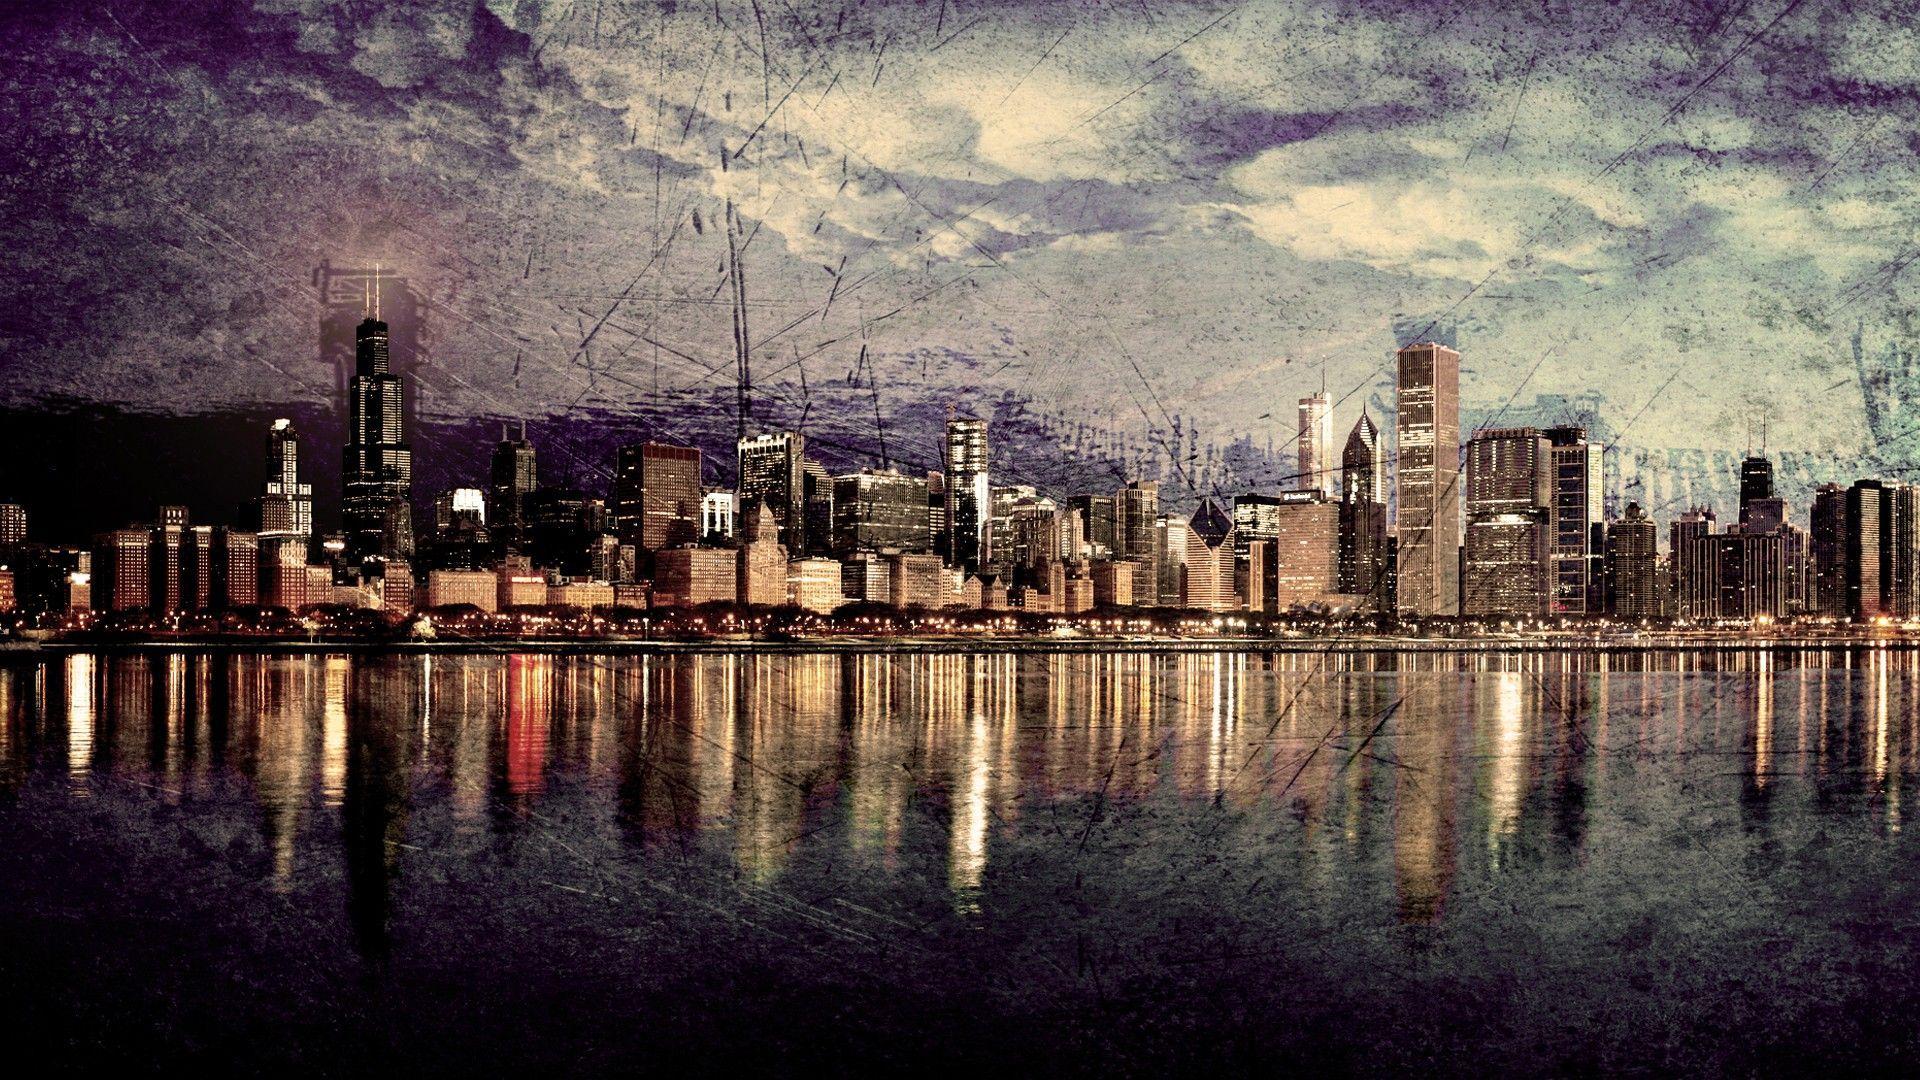 Chicago Skyline At Night Wallpaper 1920x1080